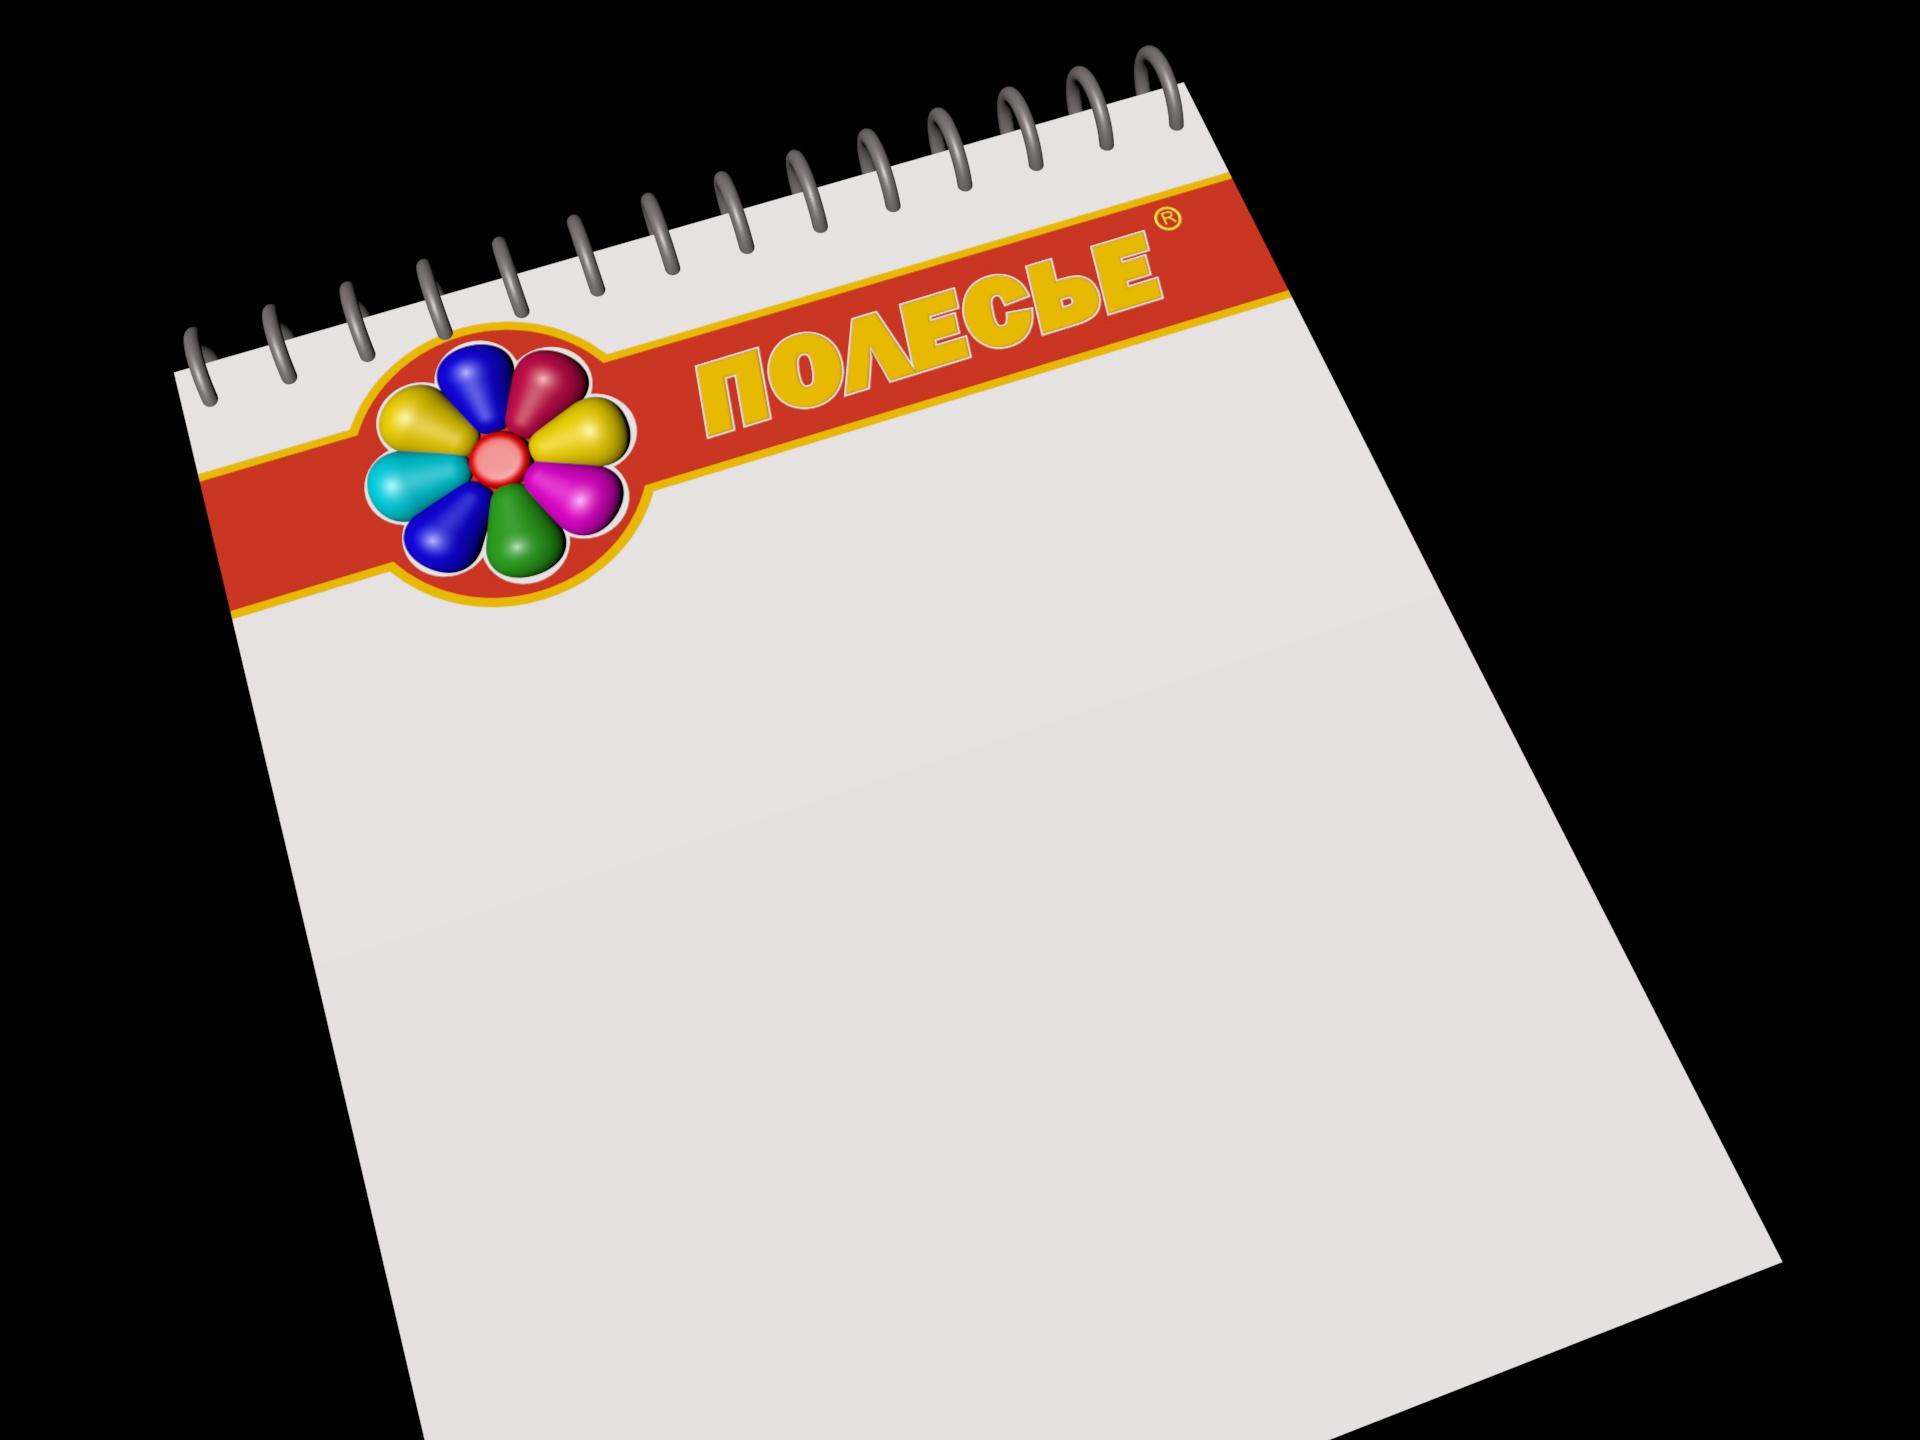 Разработка фирменного стиля на основании готового логотипа фото f_7655ab29ff7756f7.jpg